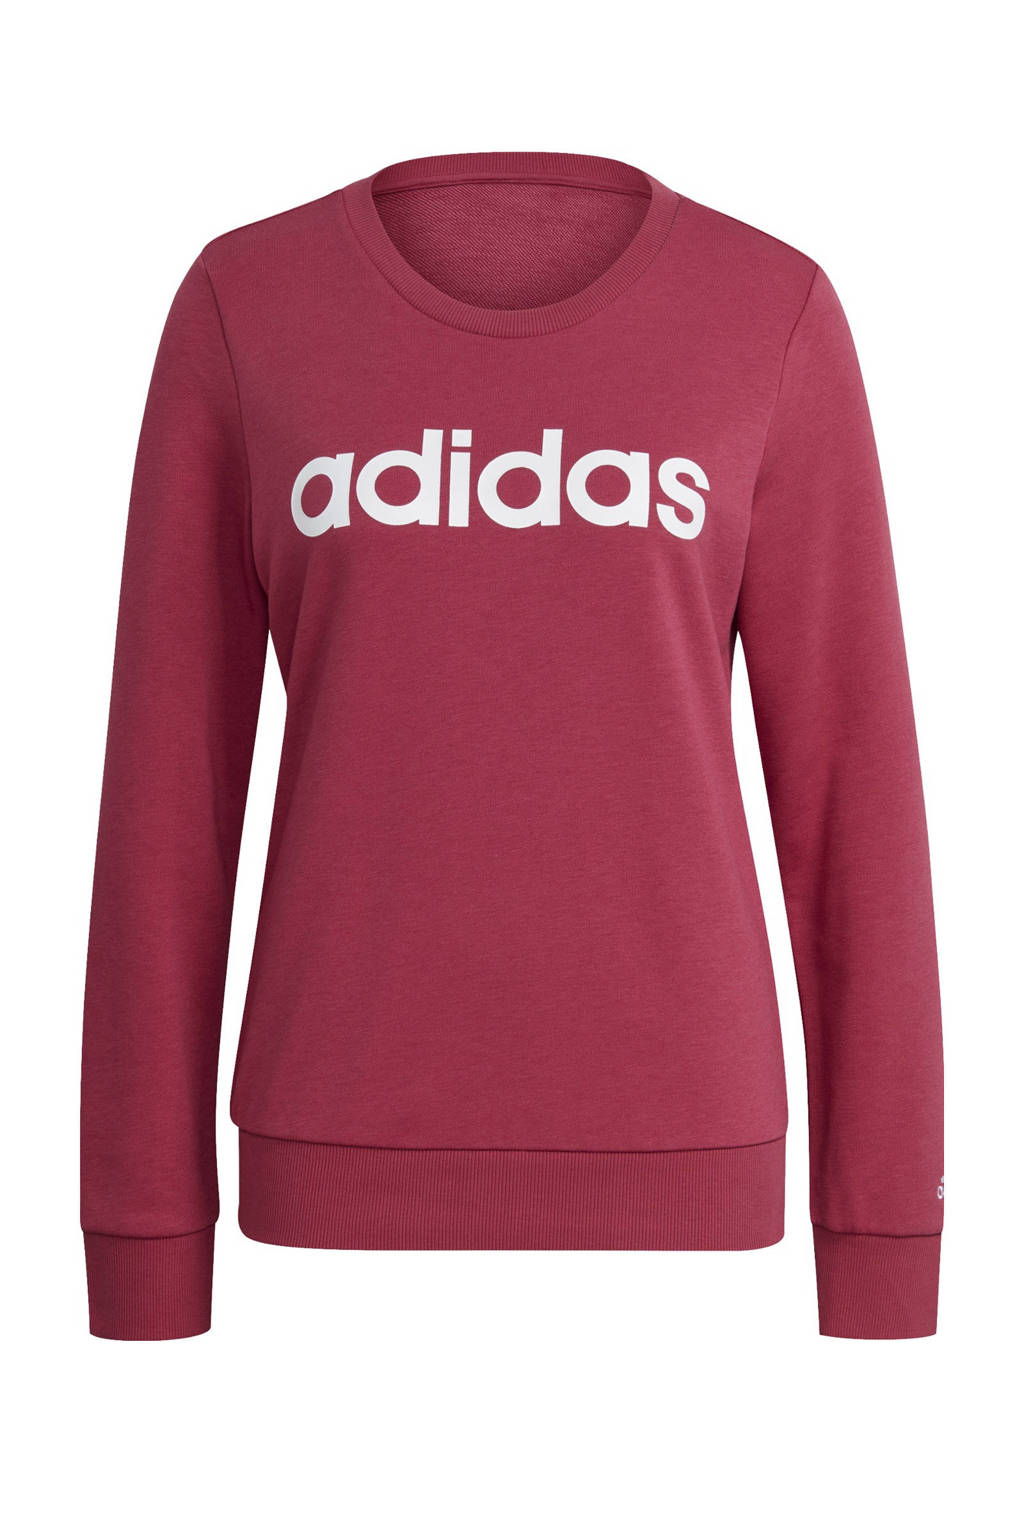 adidas Performance sportsweater donkerroze/wit, Donkerroze/wit